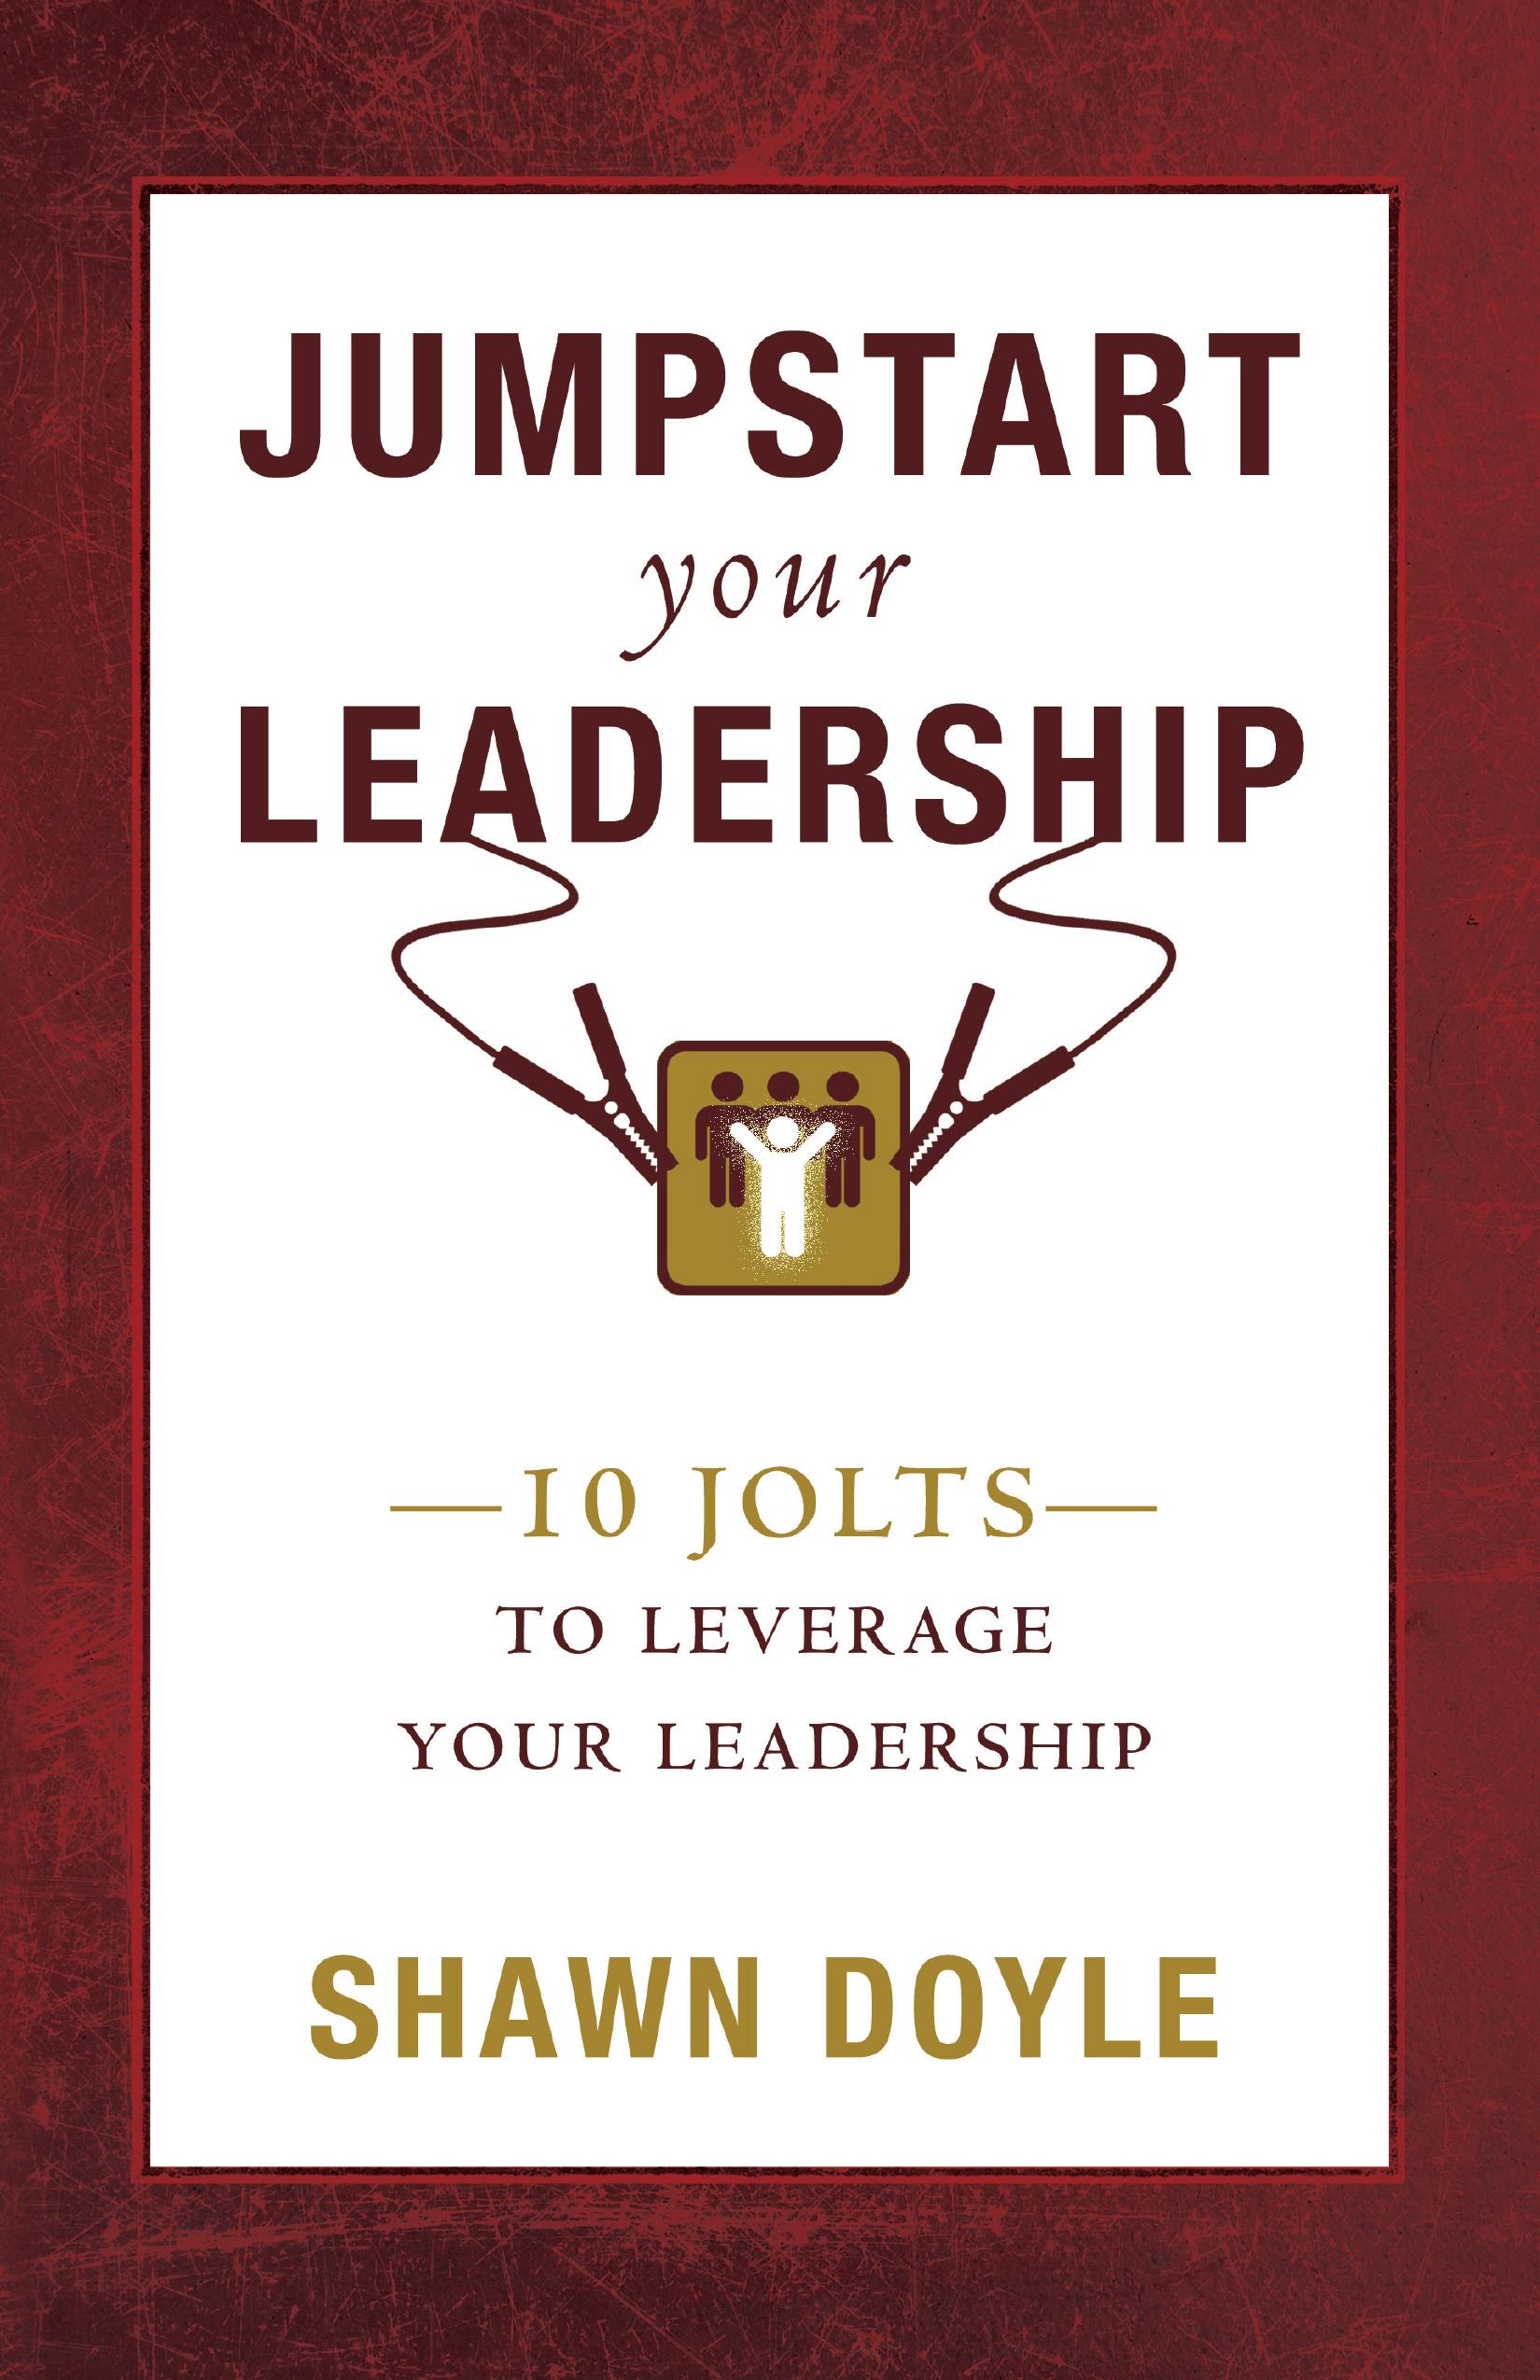 Jumpstart Your Leadership - Shawn Doyle